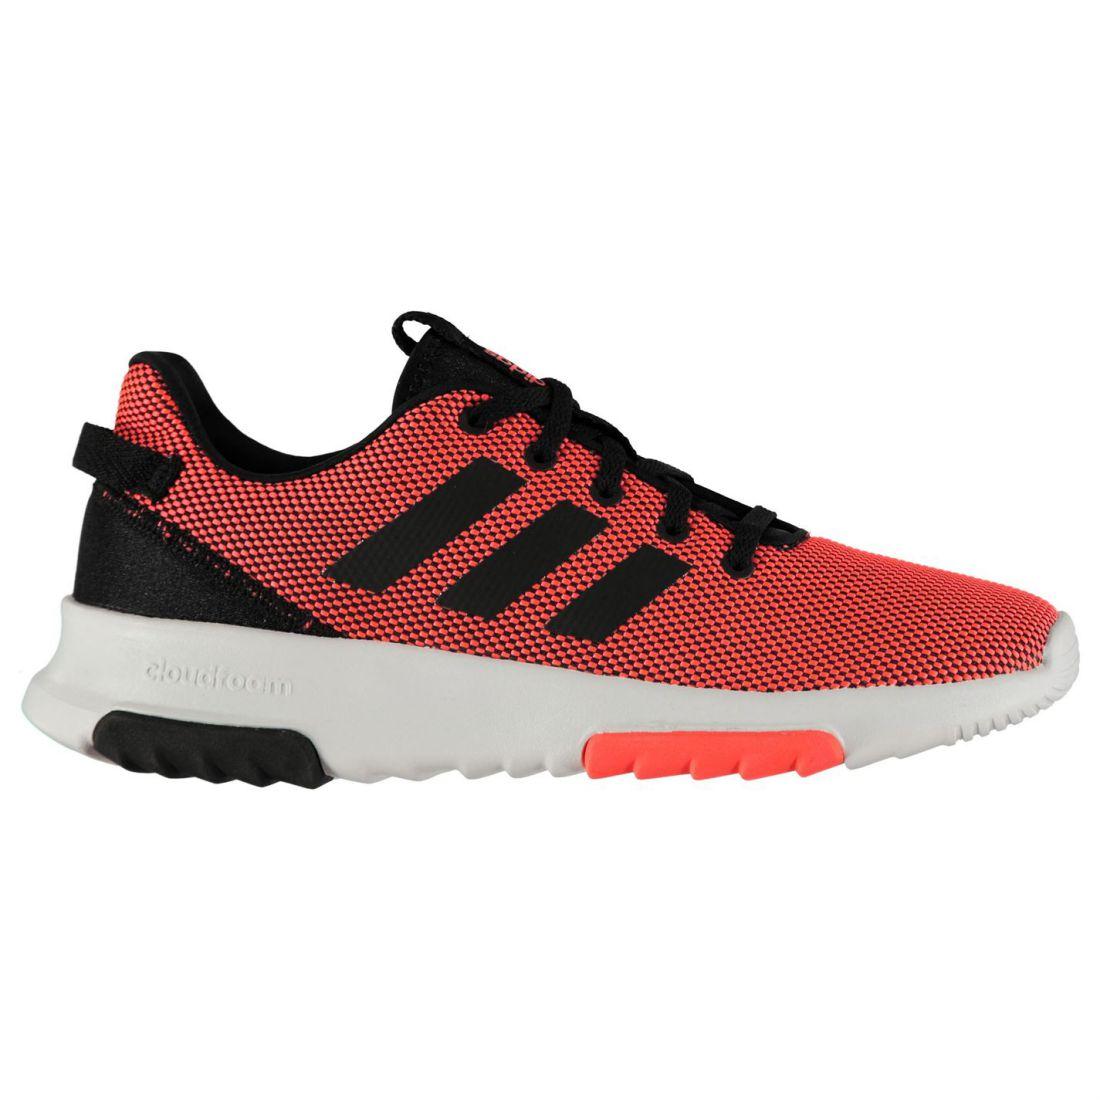 7b708442a9d adidas Kids Boys Cloudfoam Racer TR Shoes Junior Runners Lace Up Stripe  Seamless